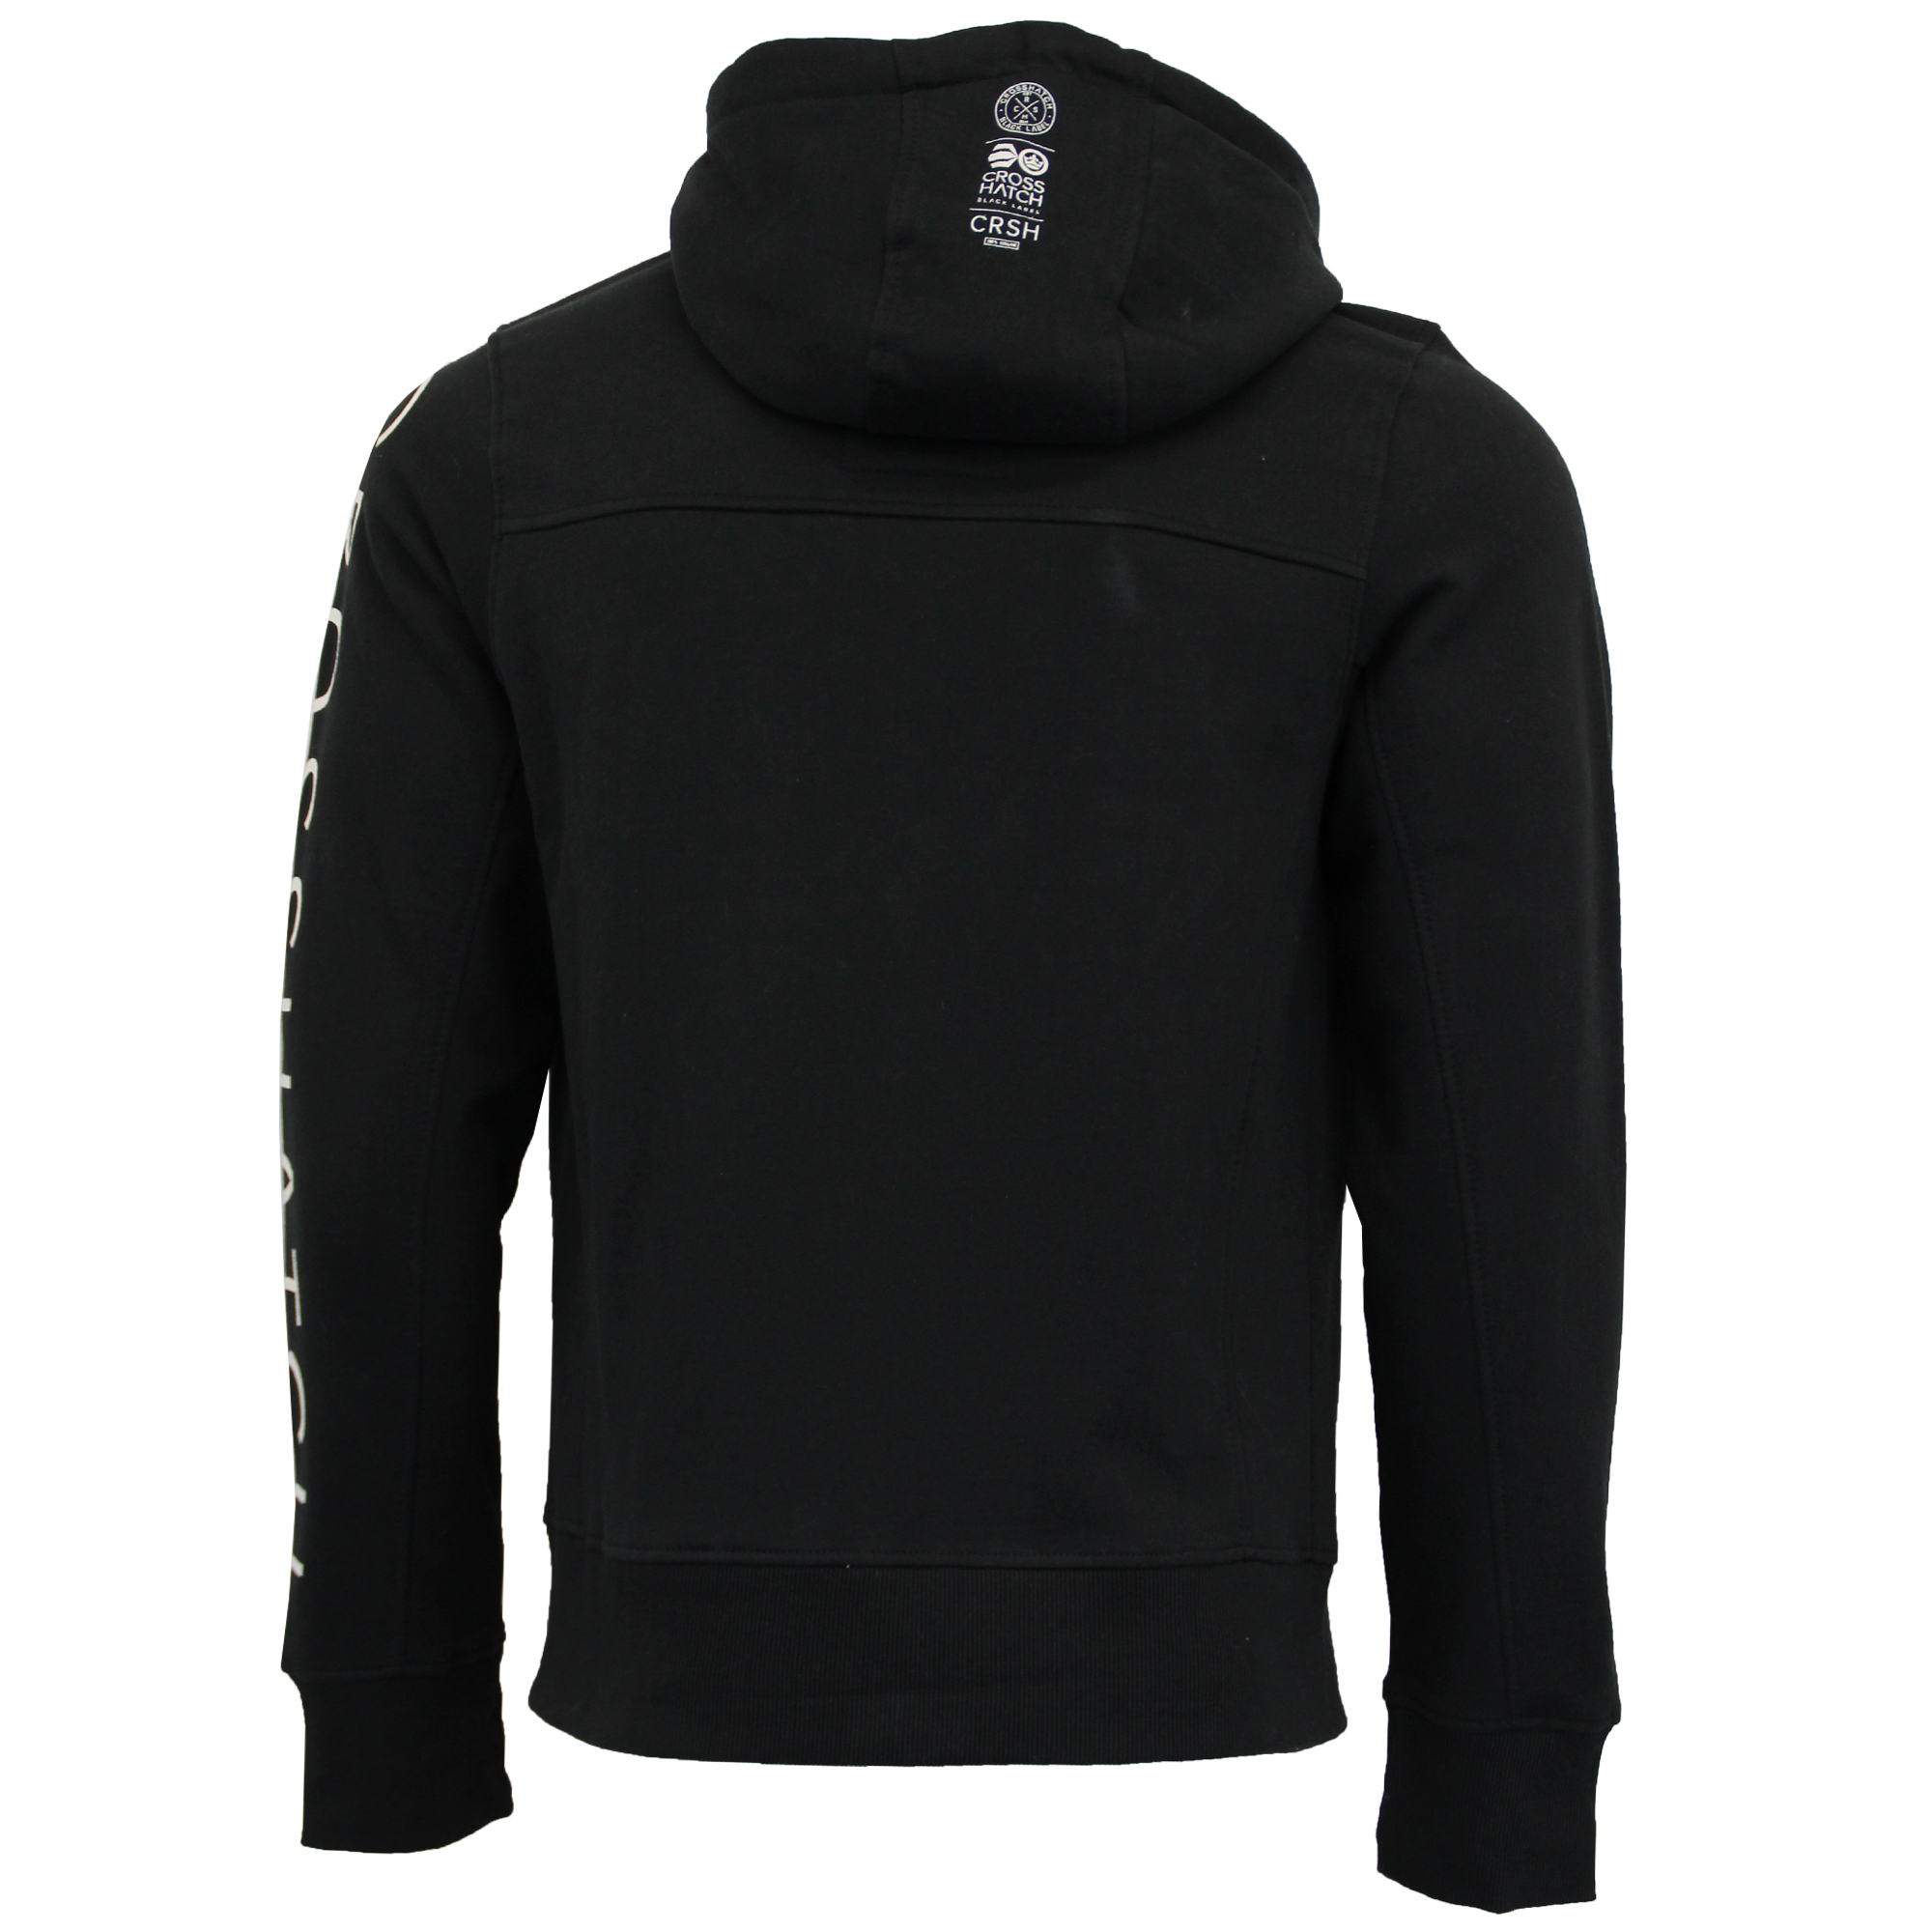 Mens-Sweatshirt-Crosshatch-Hoodie-Top-Embossed-Logo-Print-Sweat-Fleece-Lined-New thumbnail 4